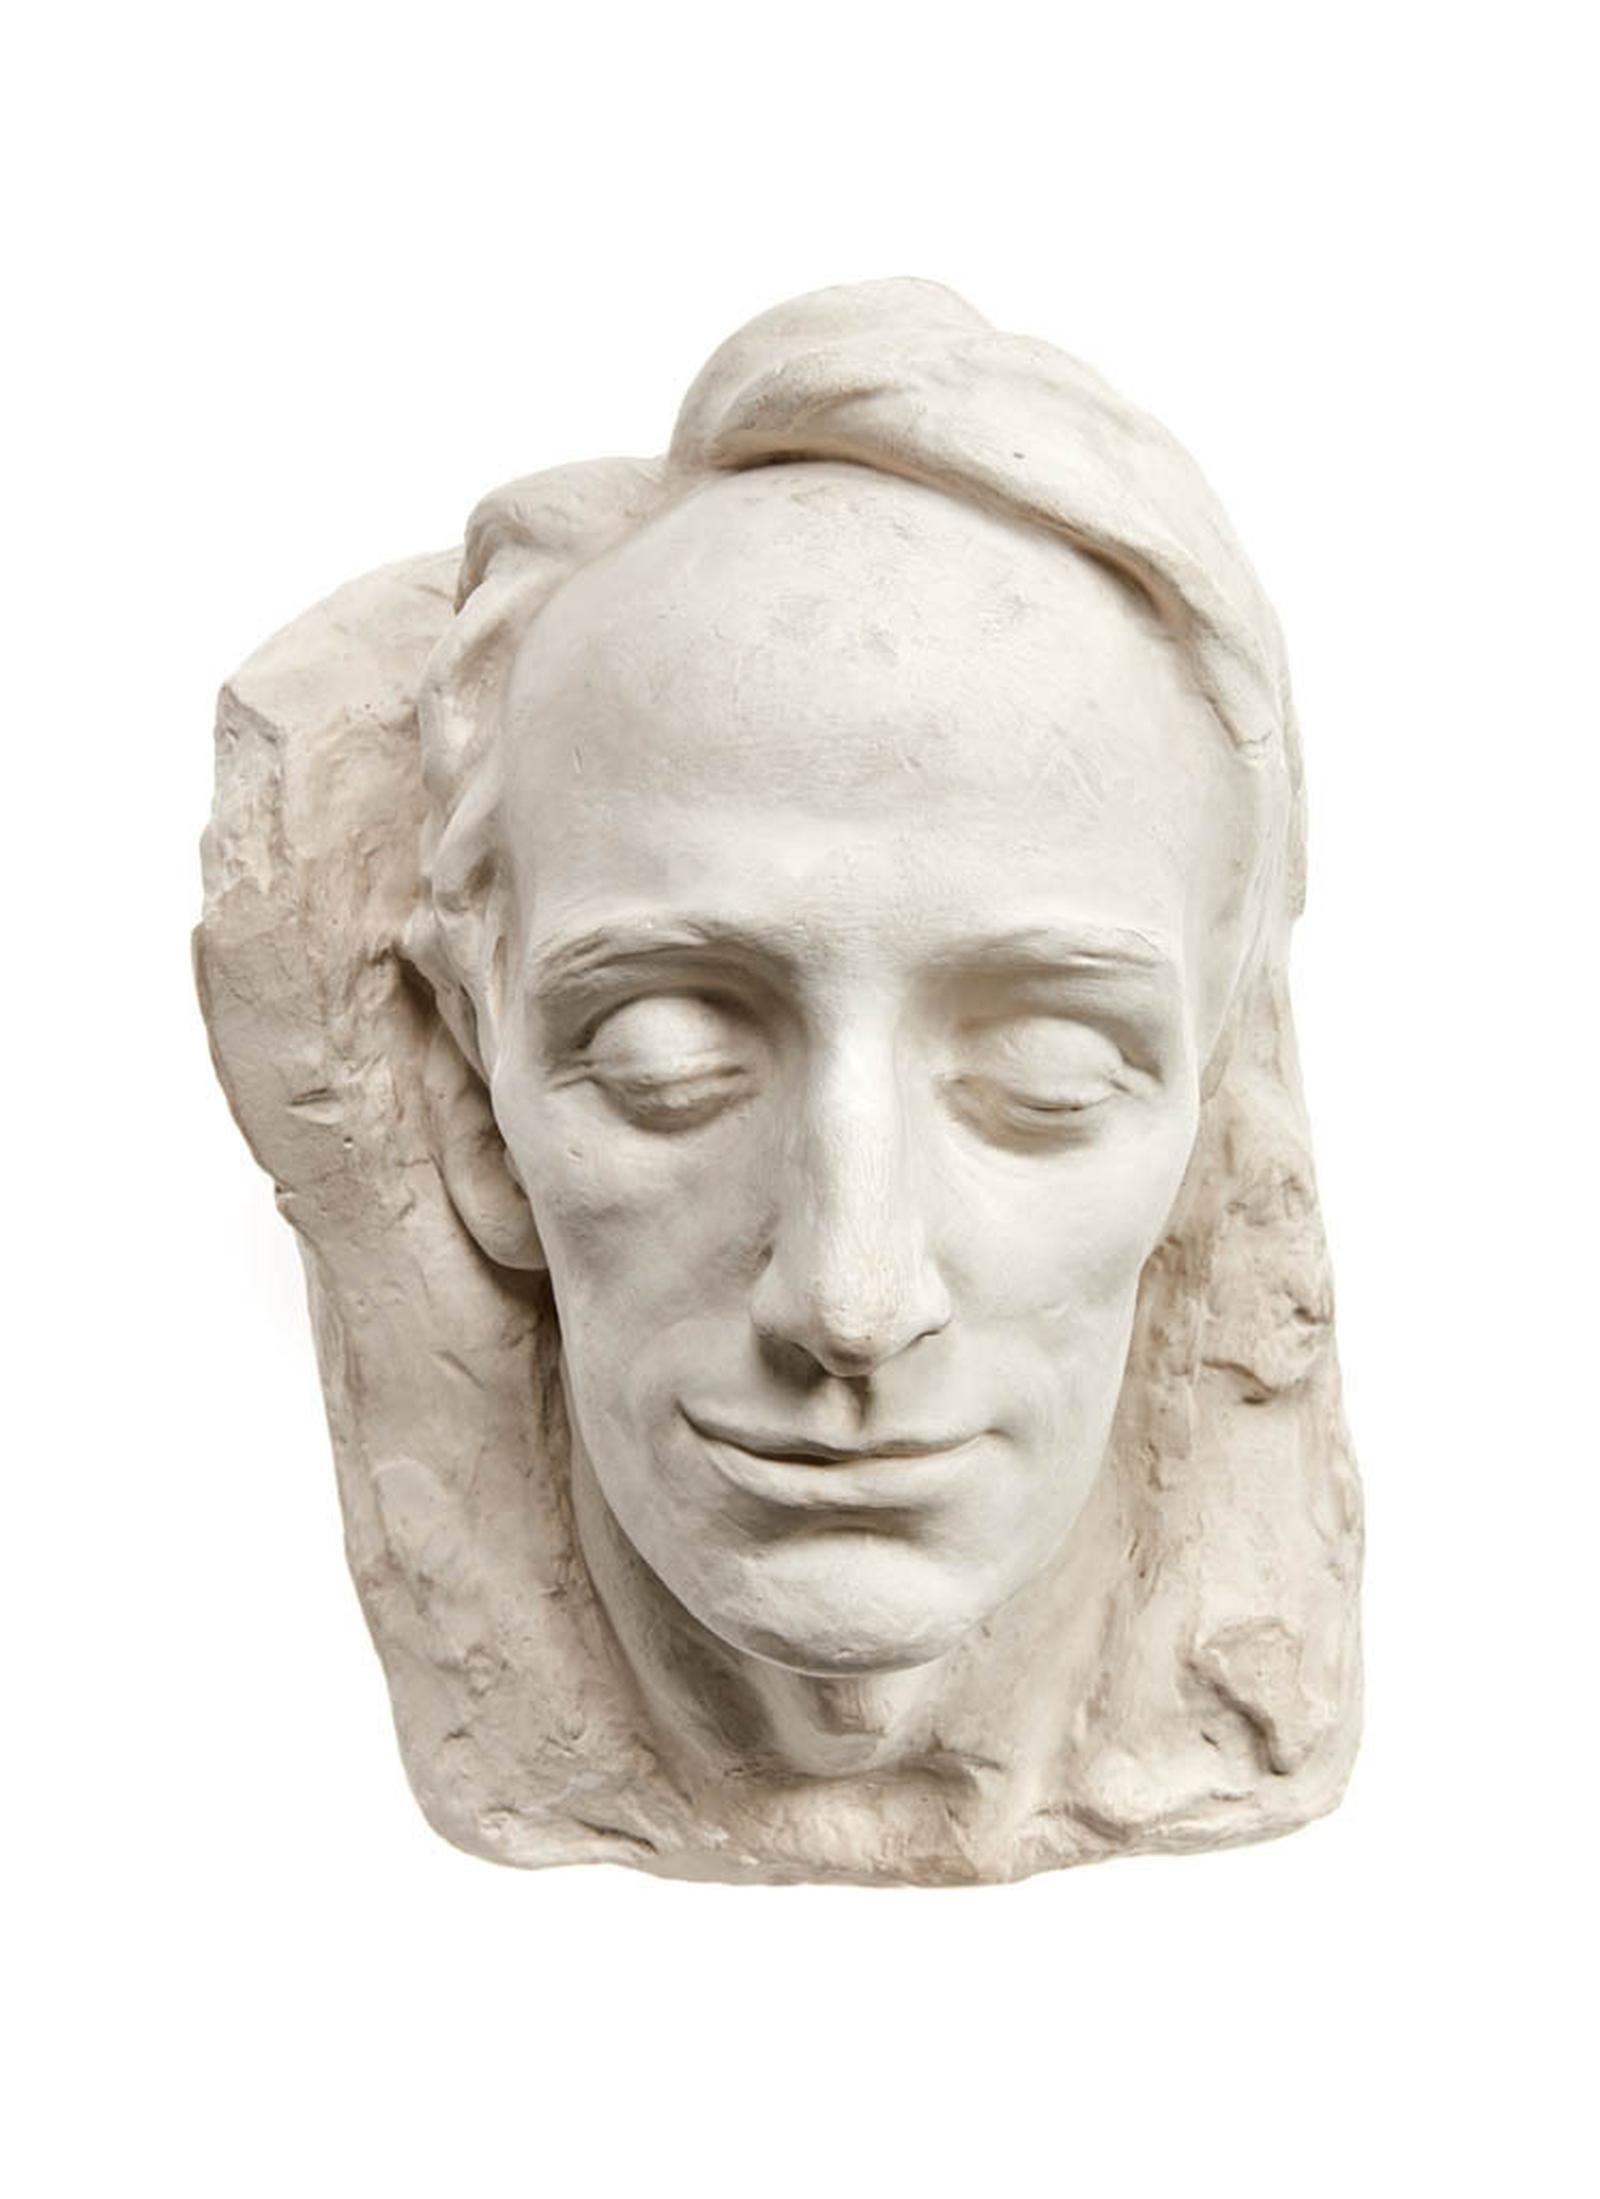 Image - Terence McSwiney life mask, plaster. Image courtesy of the National Museum of Ireland HE:EW.793